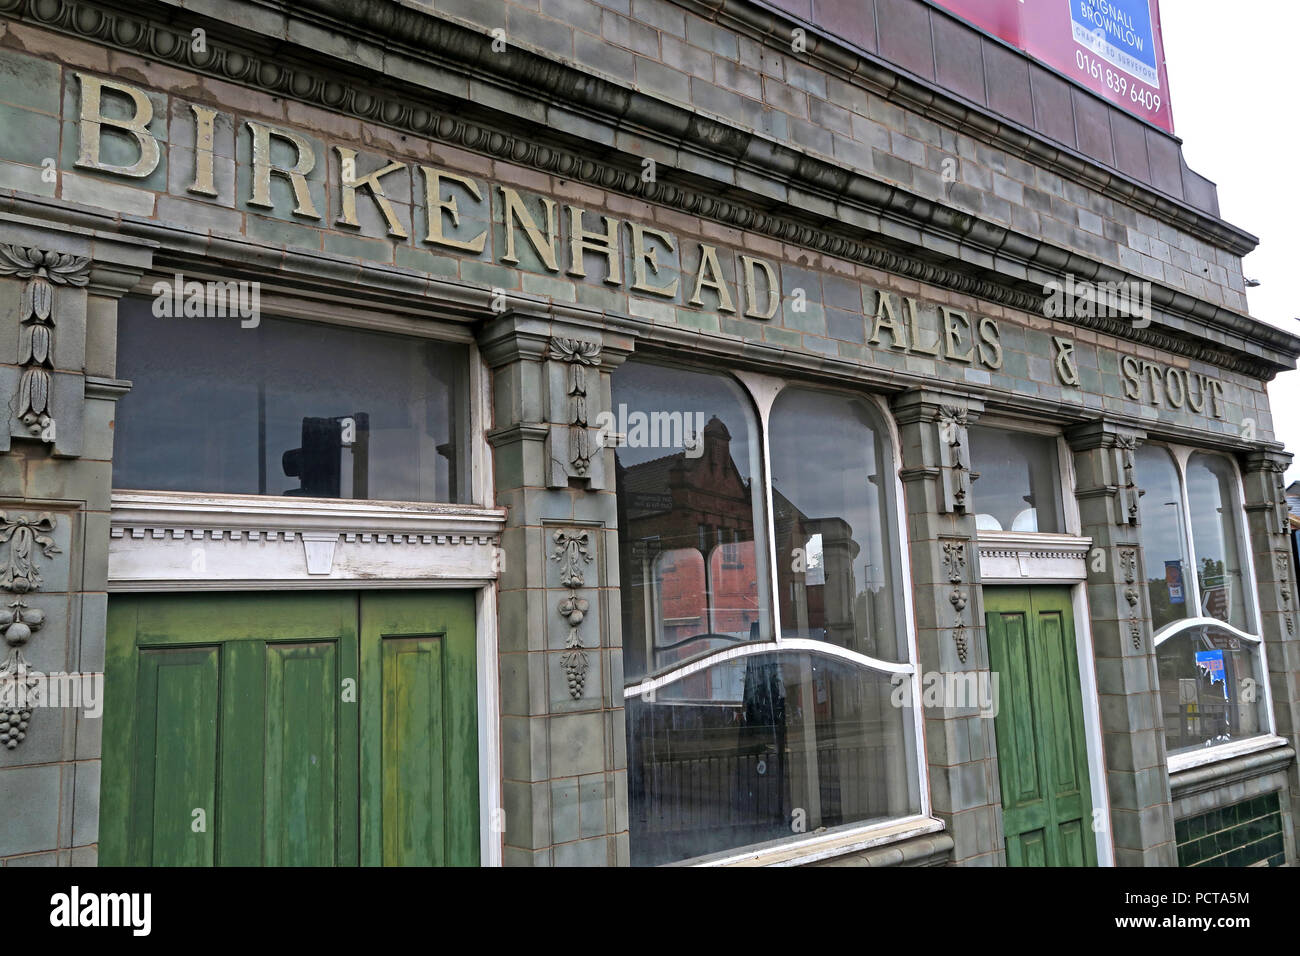 GoTonySmith,@HotpixUK,history,historic,building,United Kingdom,Tiled,tiles,Exterior,Stout,UK,North West,England,Beer,ale,ales,bar,pub,Birkenhead Brewery Co Ltd,Birkenhead Brewery Co,73 Oxton Road,Cooks Brewery,boozer,shut,closed,flats,brewer,Liverbird,logo,Liver Bird,Liver Bird Logo,Trade Mark,Trademark,iconic,iconic pub,tiled pub,tiled bar